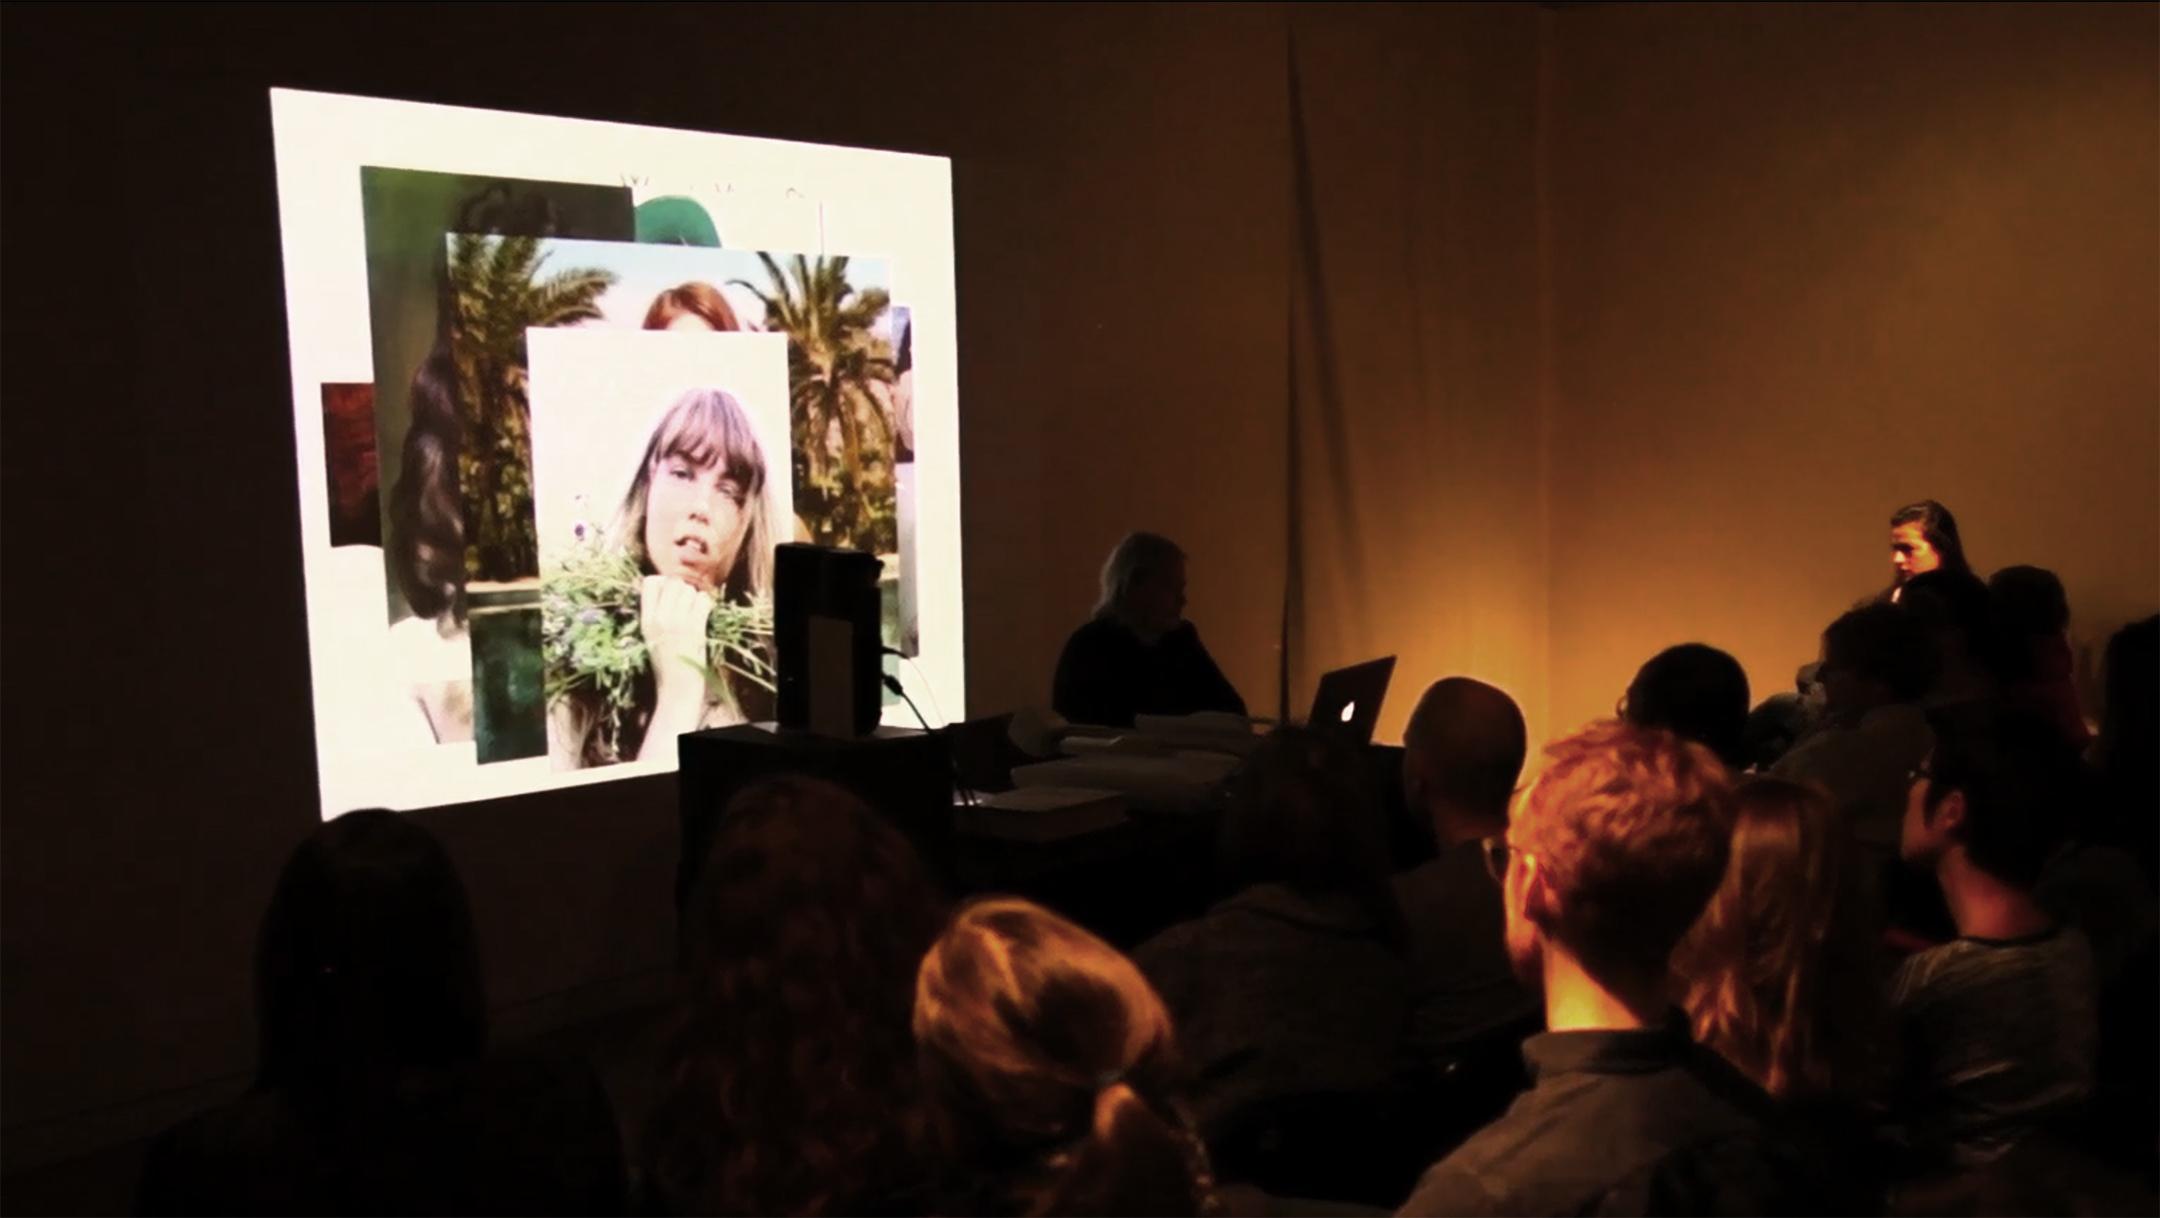 Performance Still, Gallery 44, Toronto, 2016